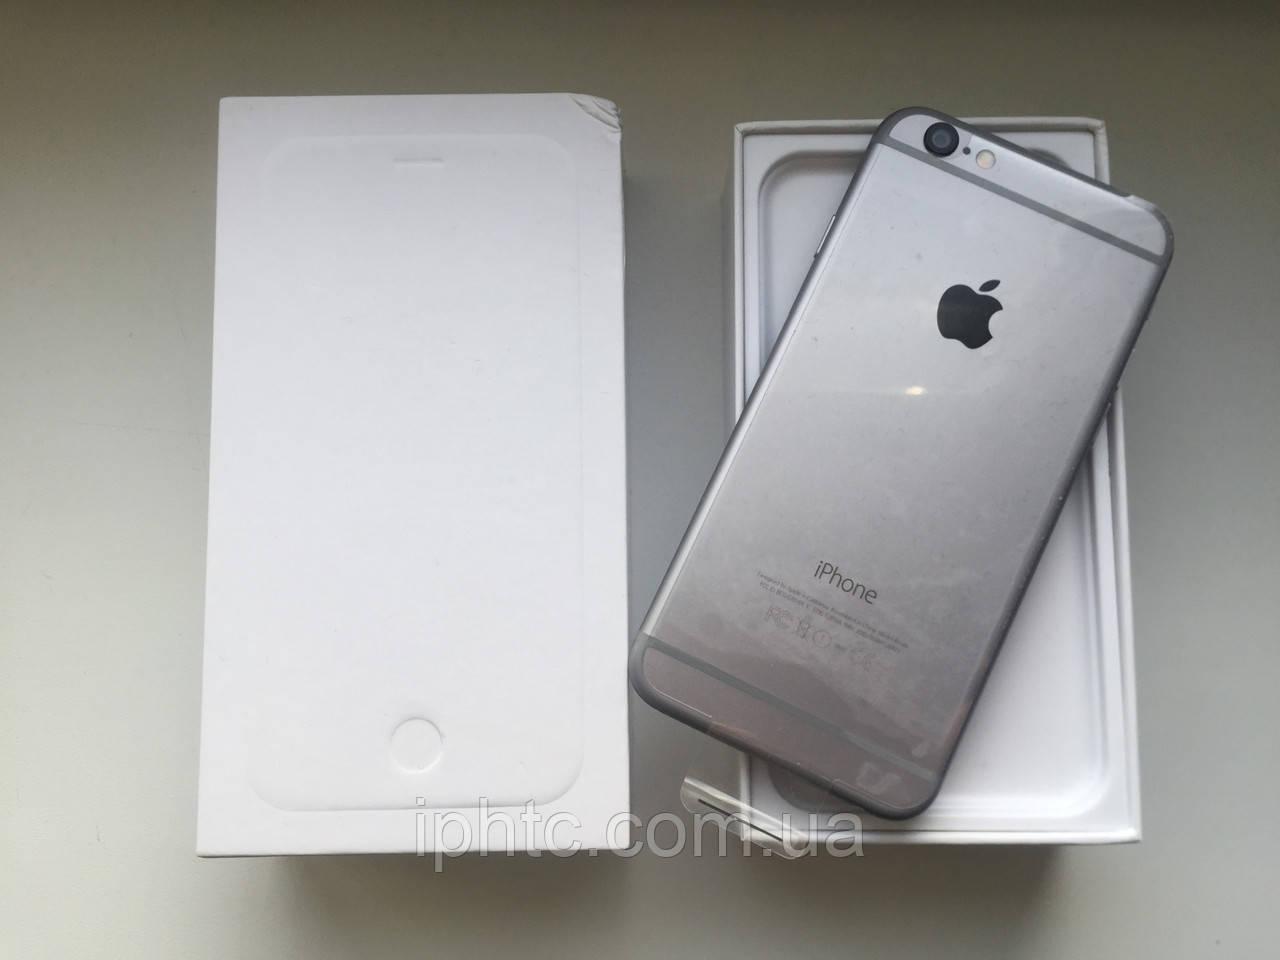 Apple iPhone 6 16GB Space Grey /Новый / NeverLock Запечатан